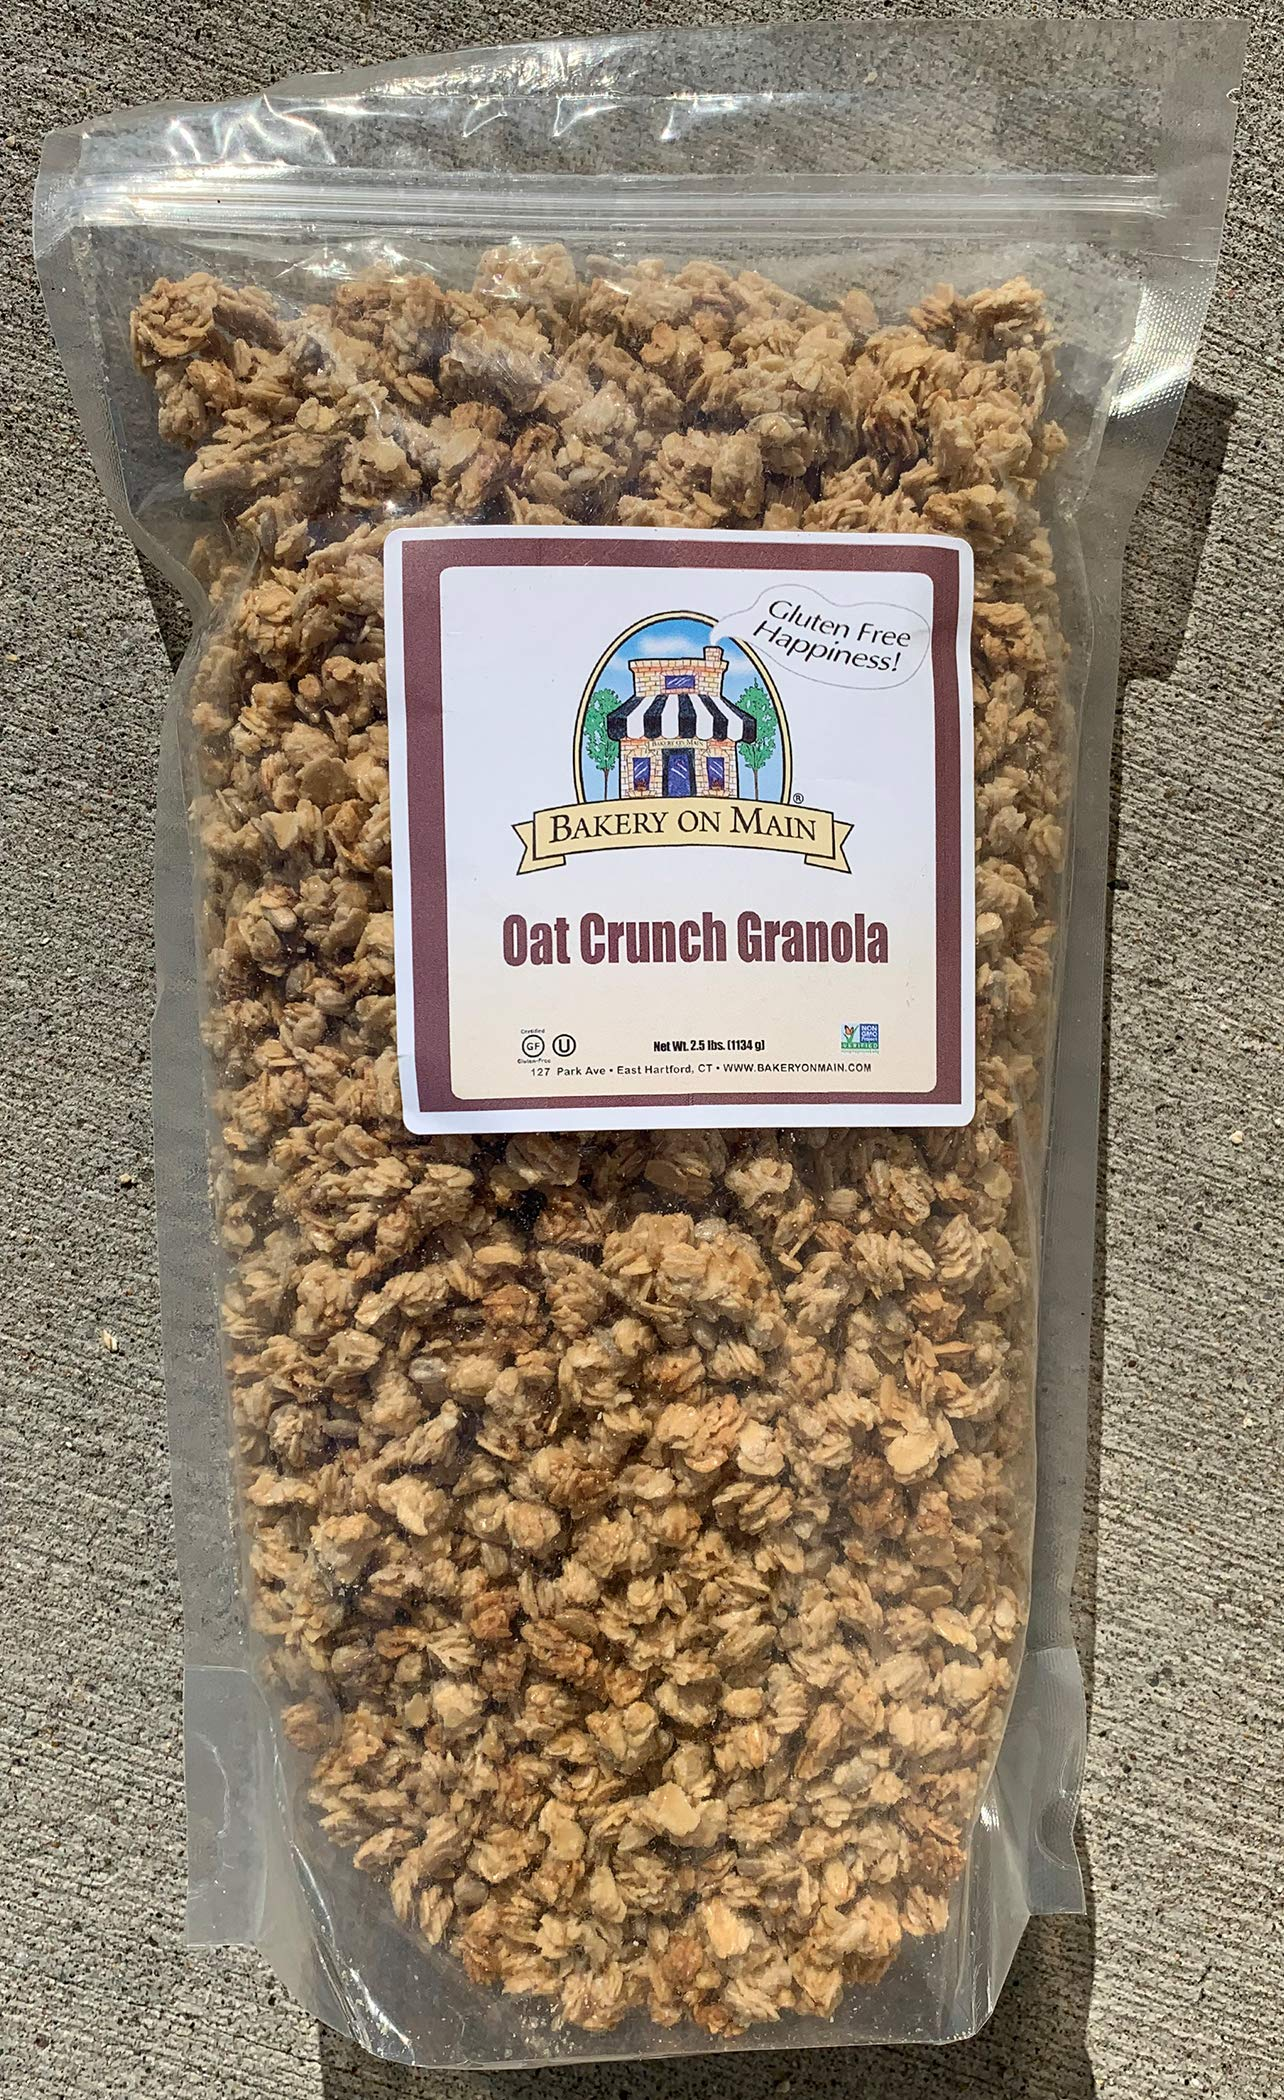 Bakery On Main Gluten-Free, Non GMO Granola, Oat Crunch, 2.5 Pound Bulk (Pack of 10) by Bakery On Main